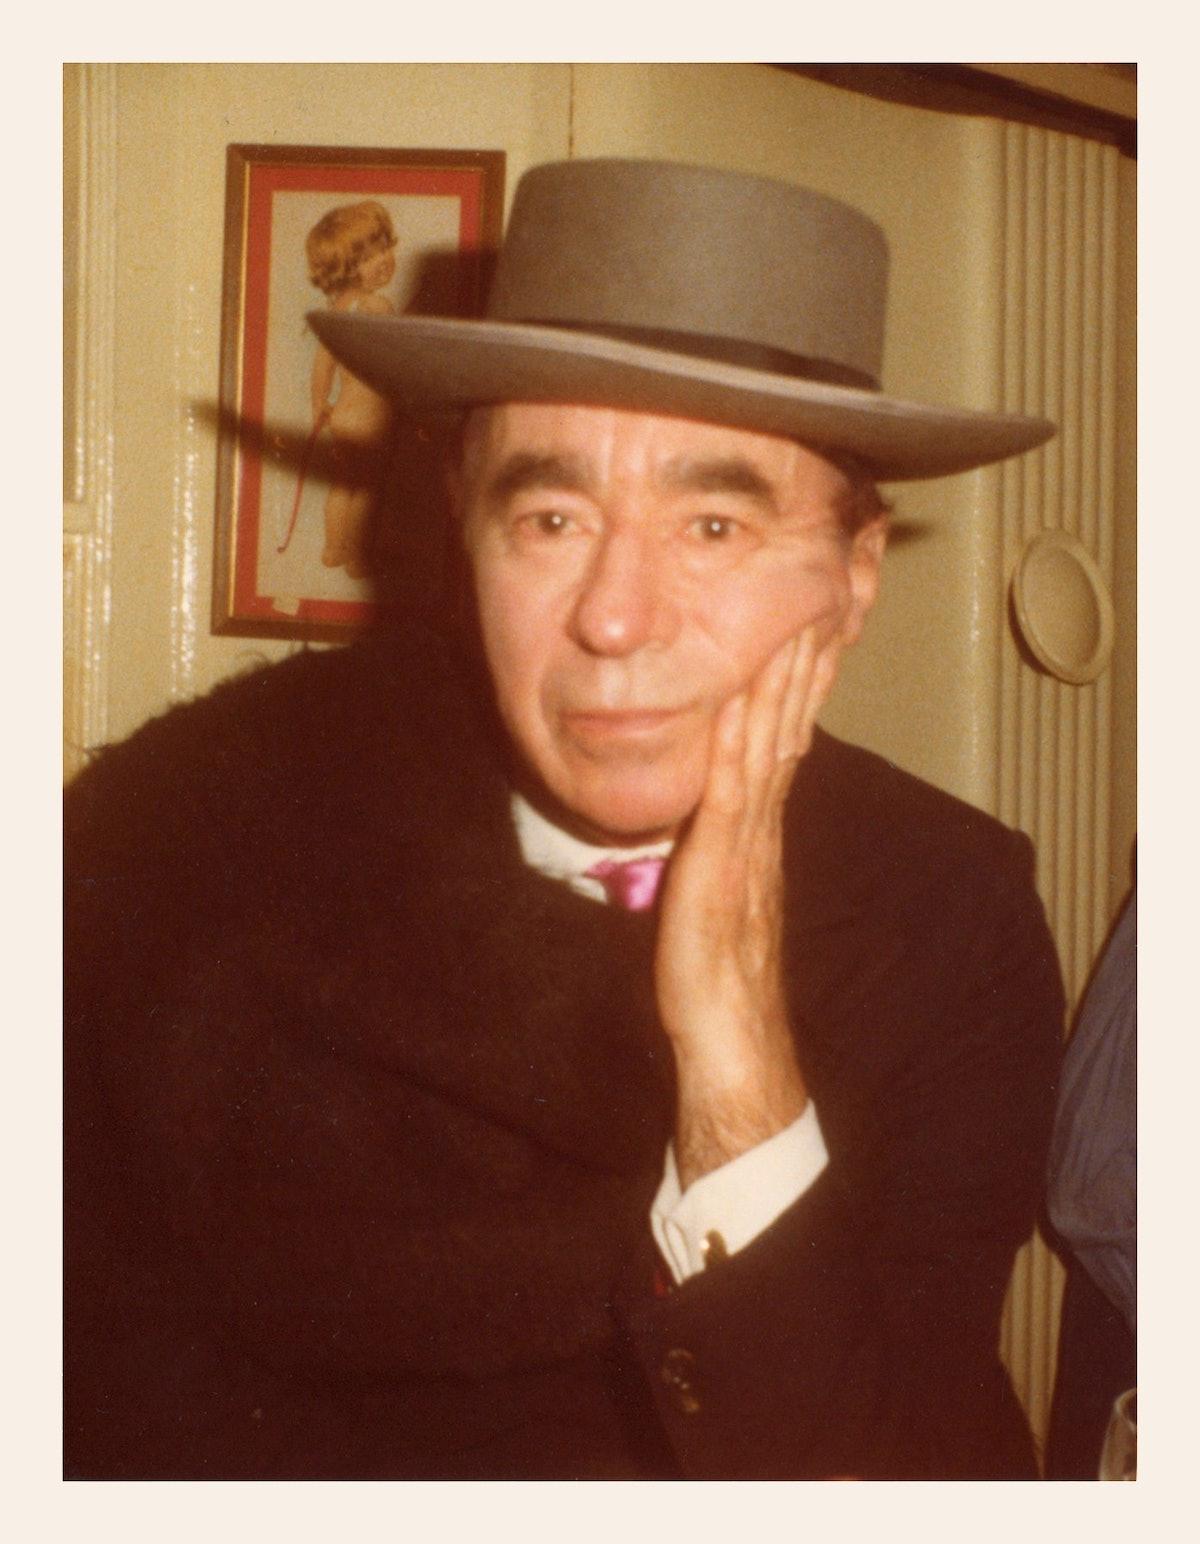 Antonio Lopez_Single_Charles James 1975.jpg